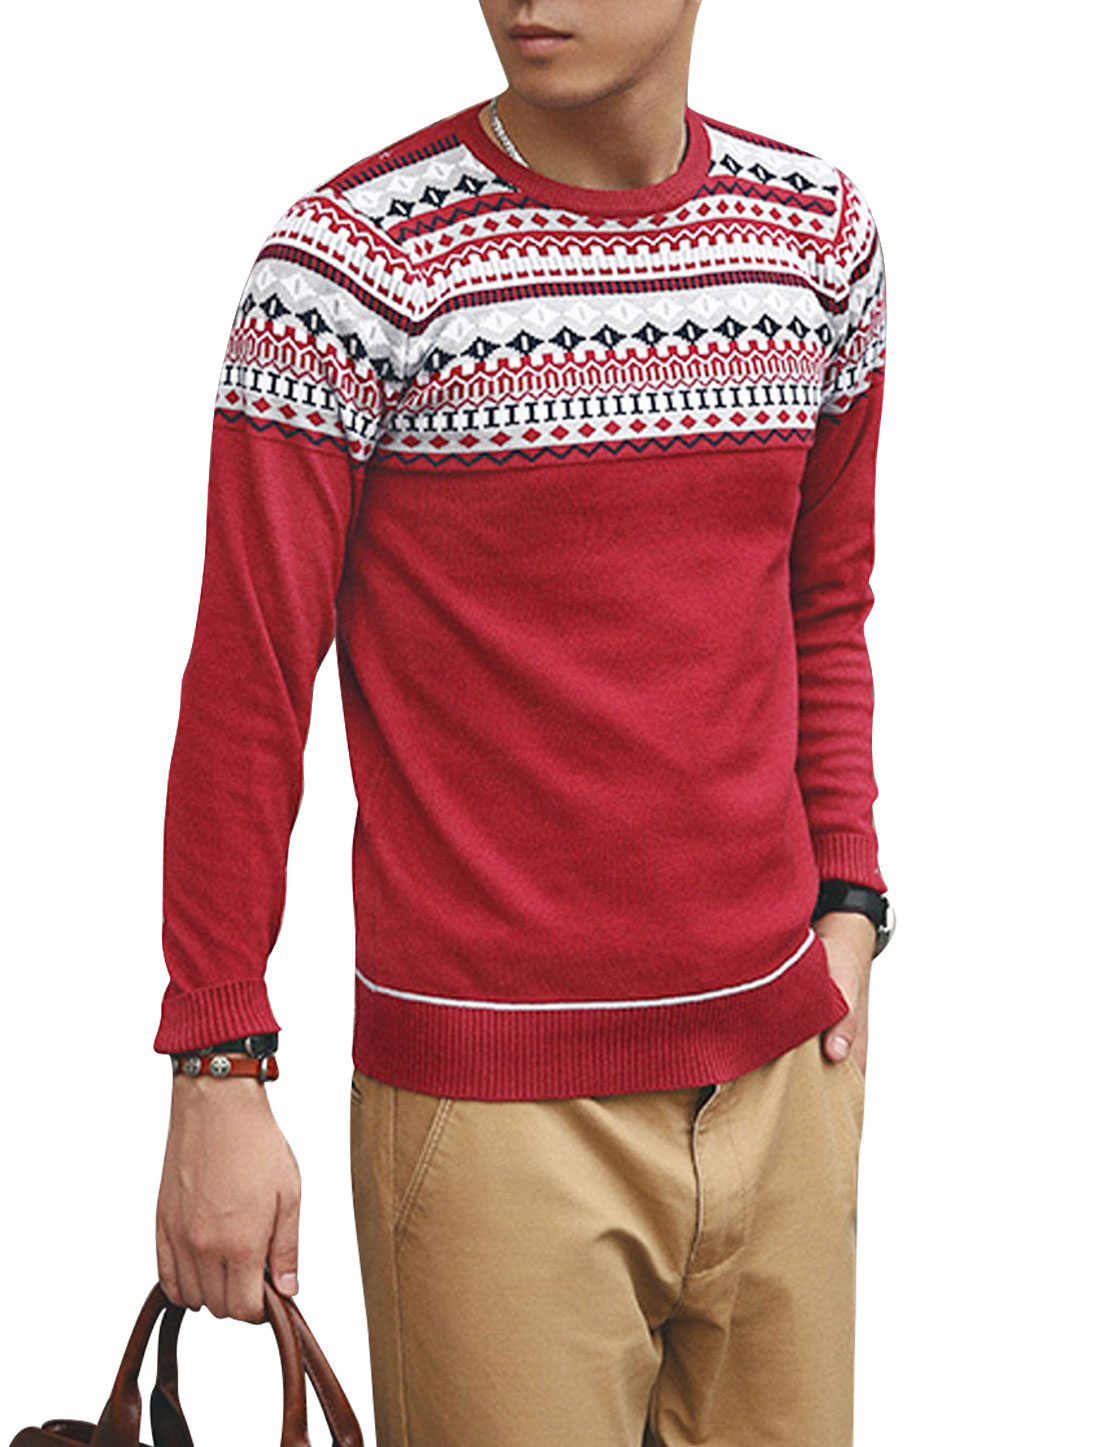 Men Argyle Pattern Zigzag Pattern Ribbing Cuffs Casual Sweater Burgundy S